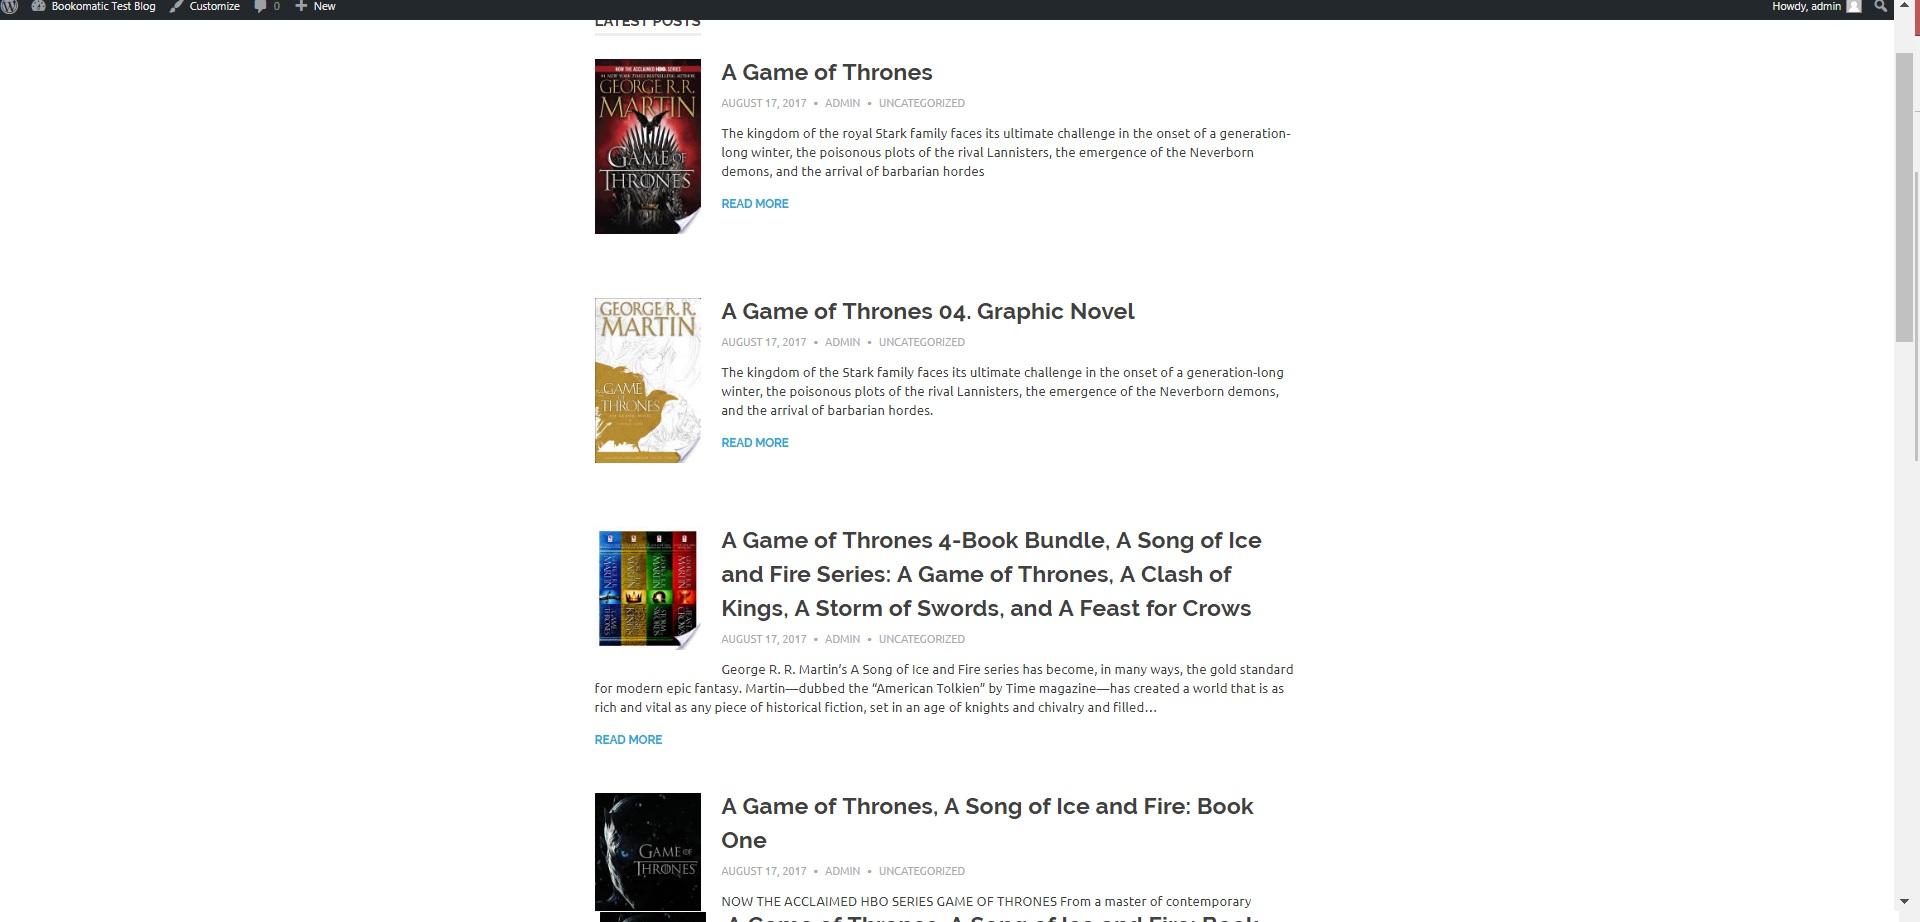 Bookomatic - Google Books Automatic Post Generator Plugin for WordPress